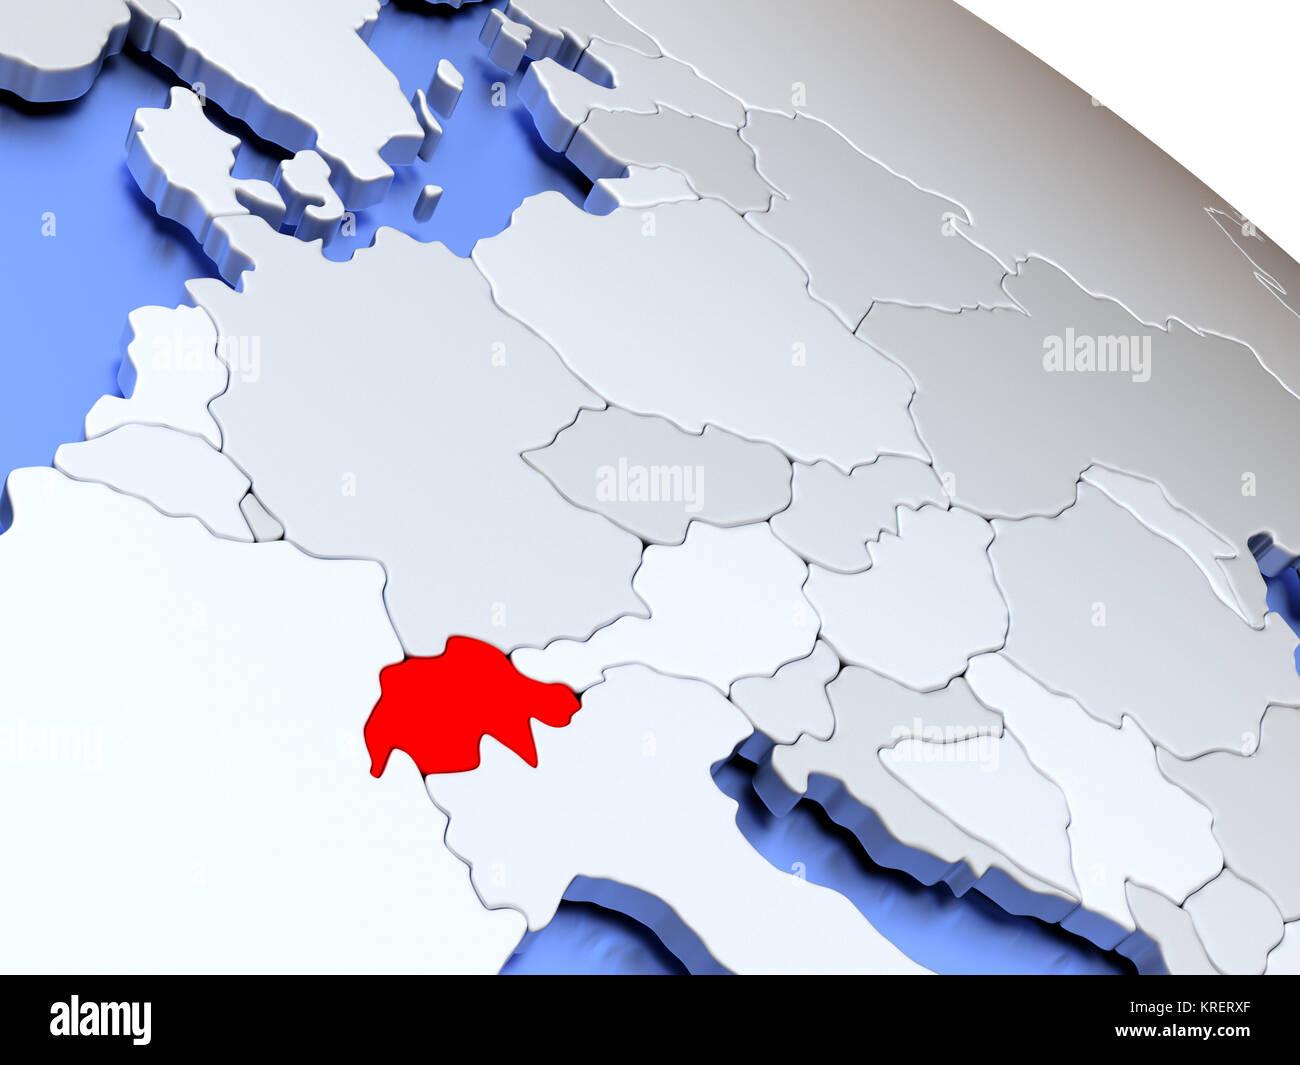 Switzerland In World Map.Switzerland On World Map Stock Photo 169356503 Alamy